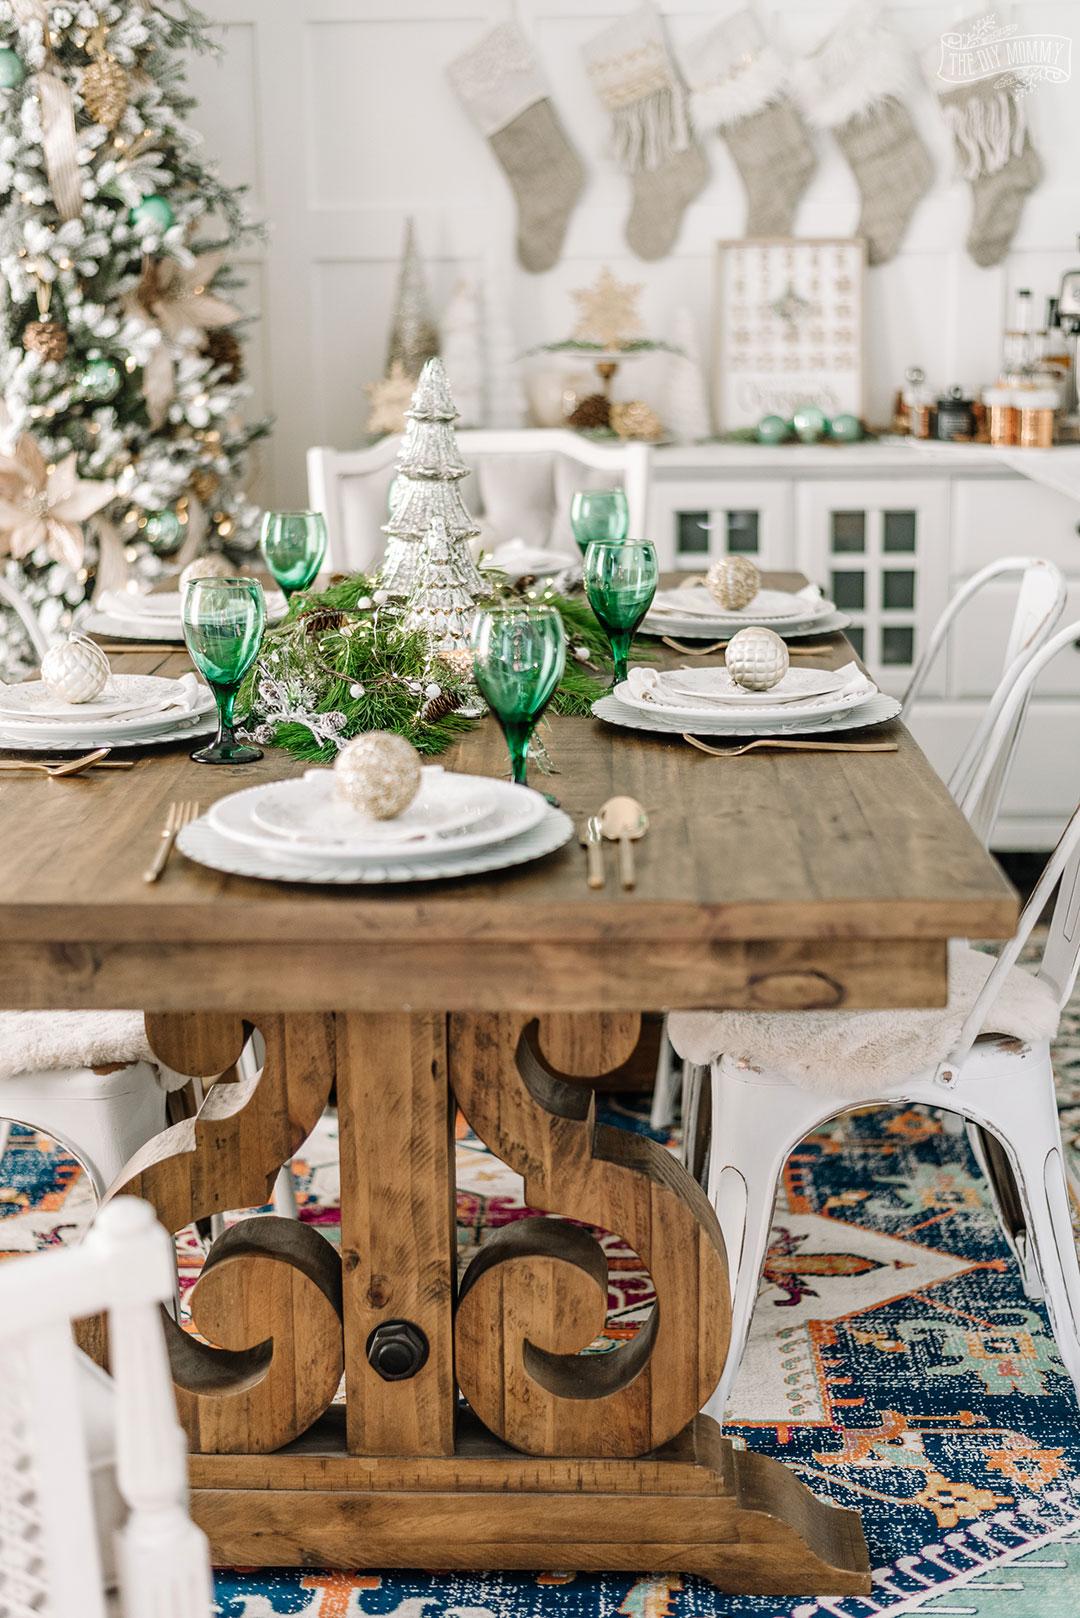 2019 Christmas Home Tour Rustic Elegant Cozy The Diy